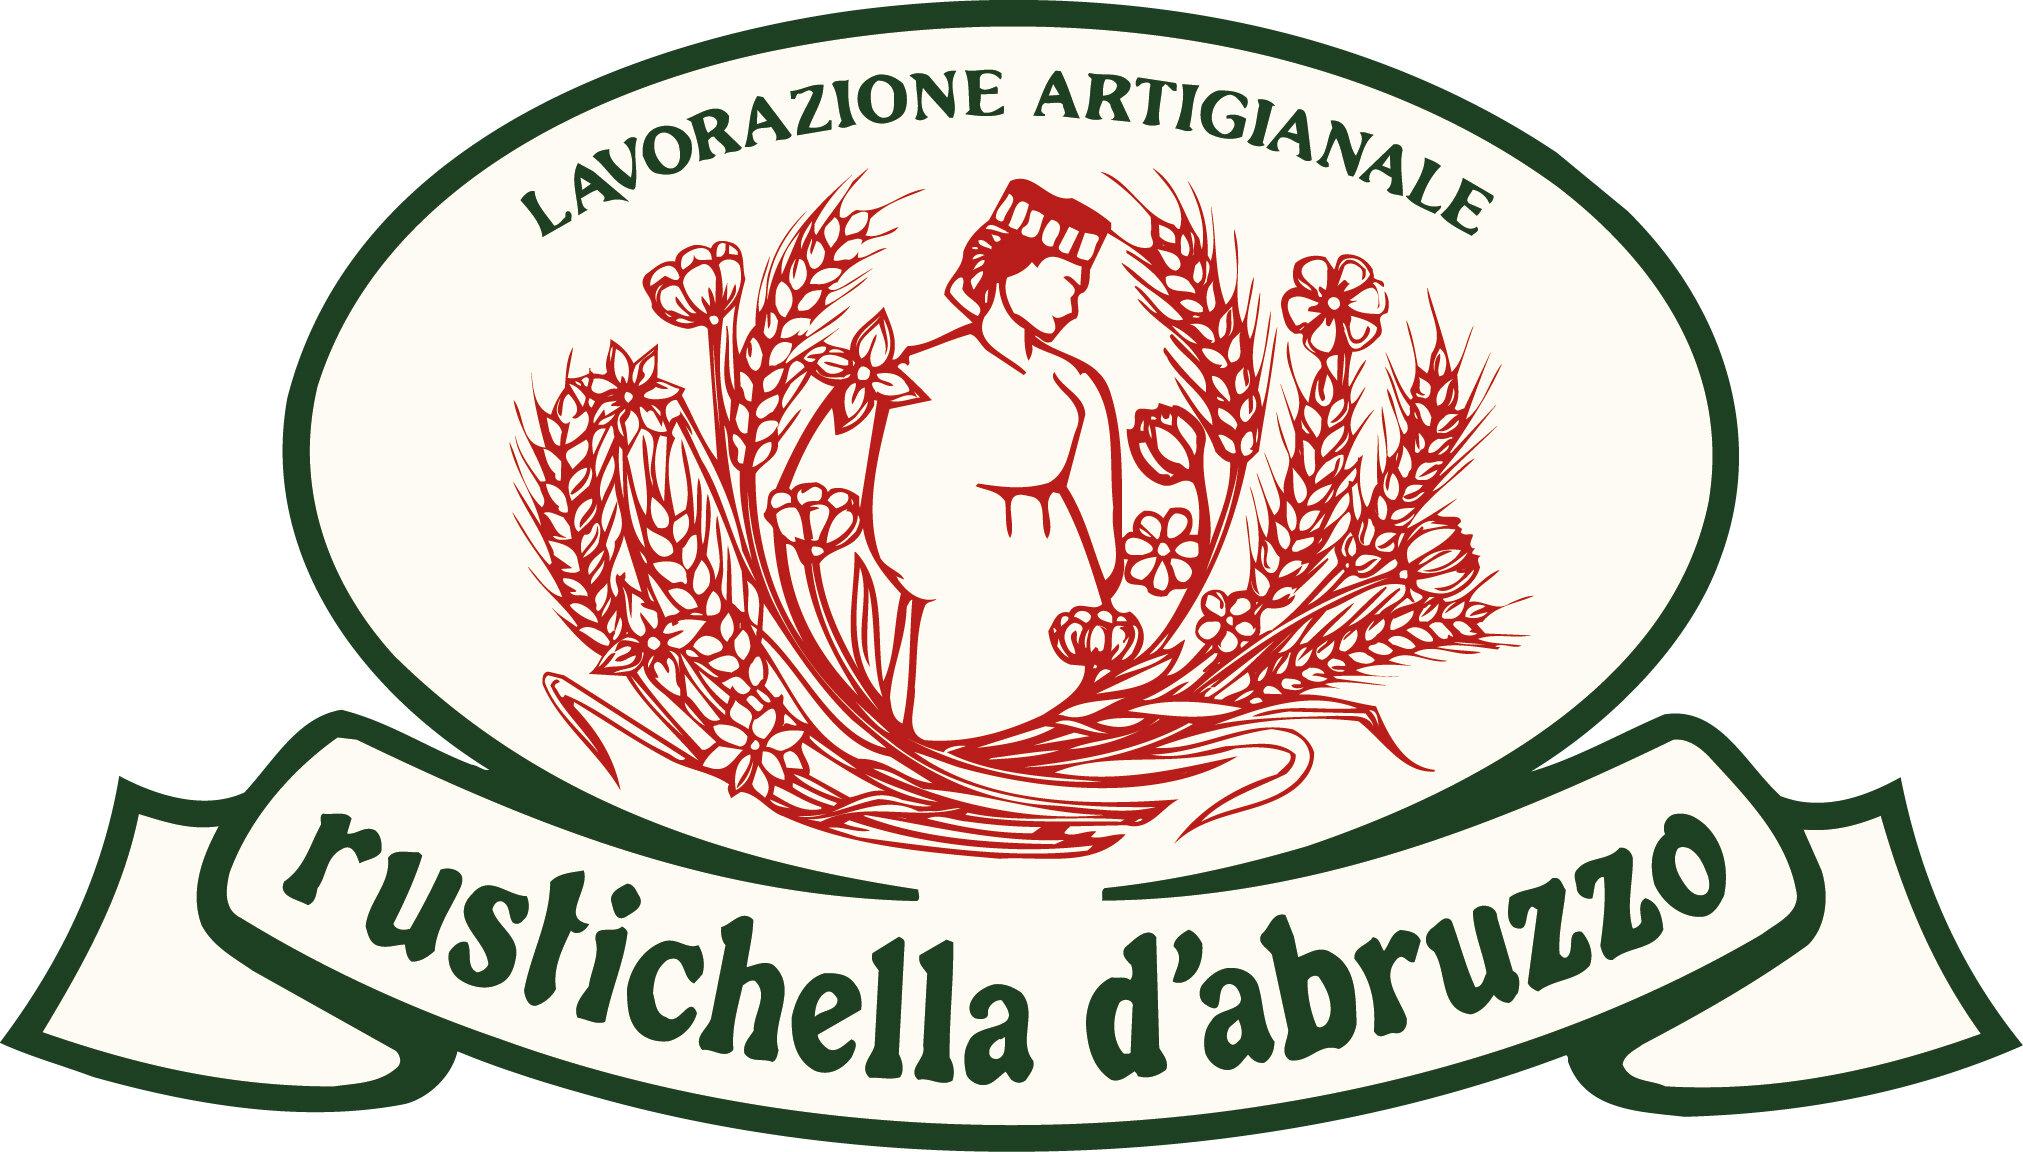 logo_rustichella_alta.jpg